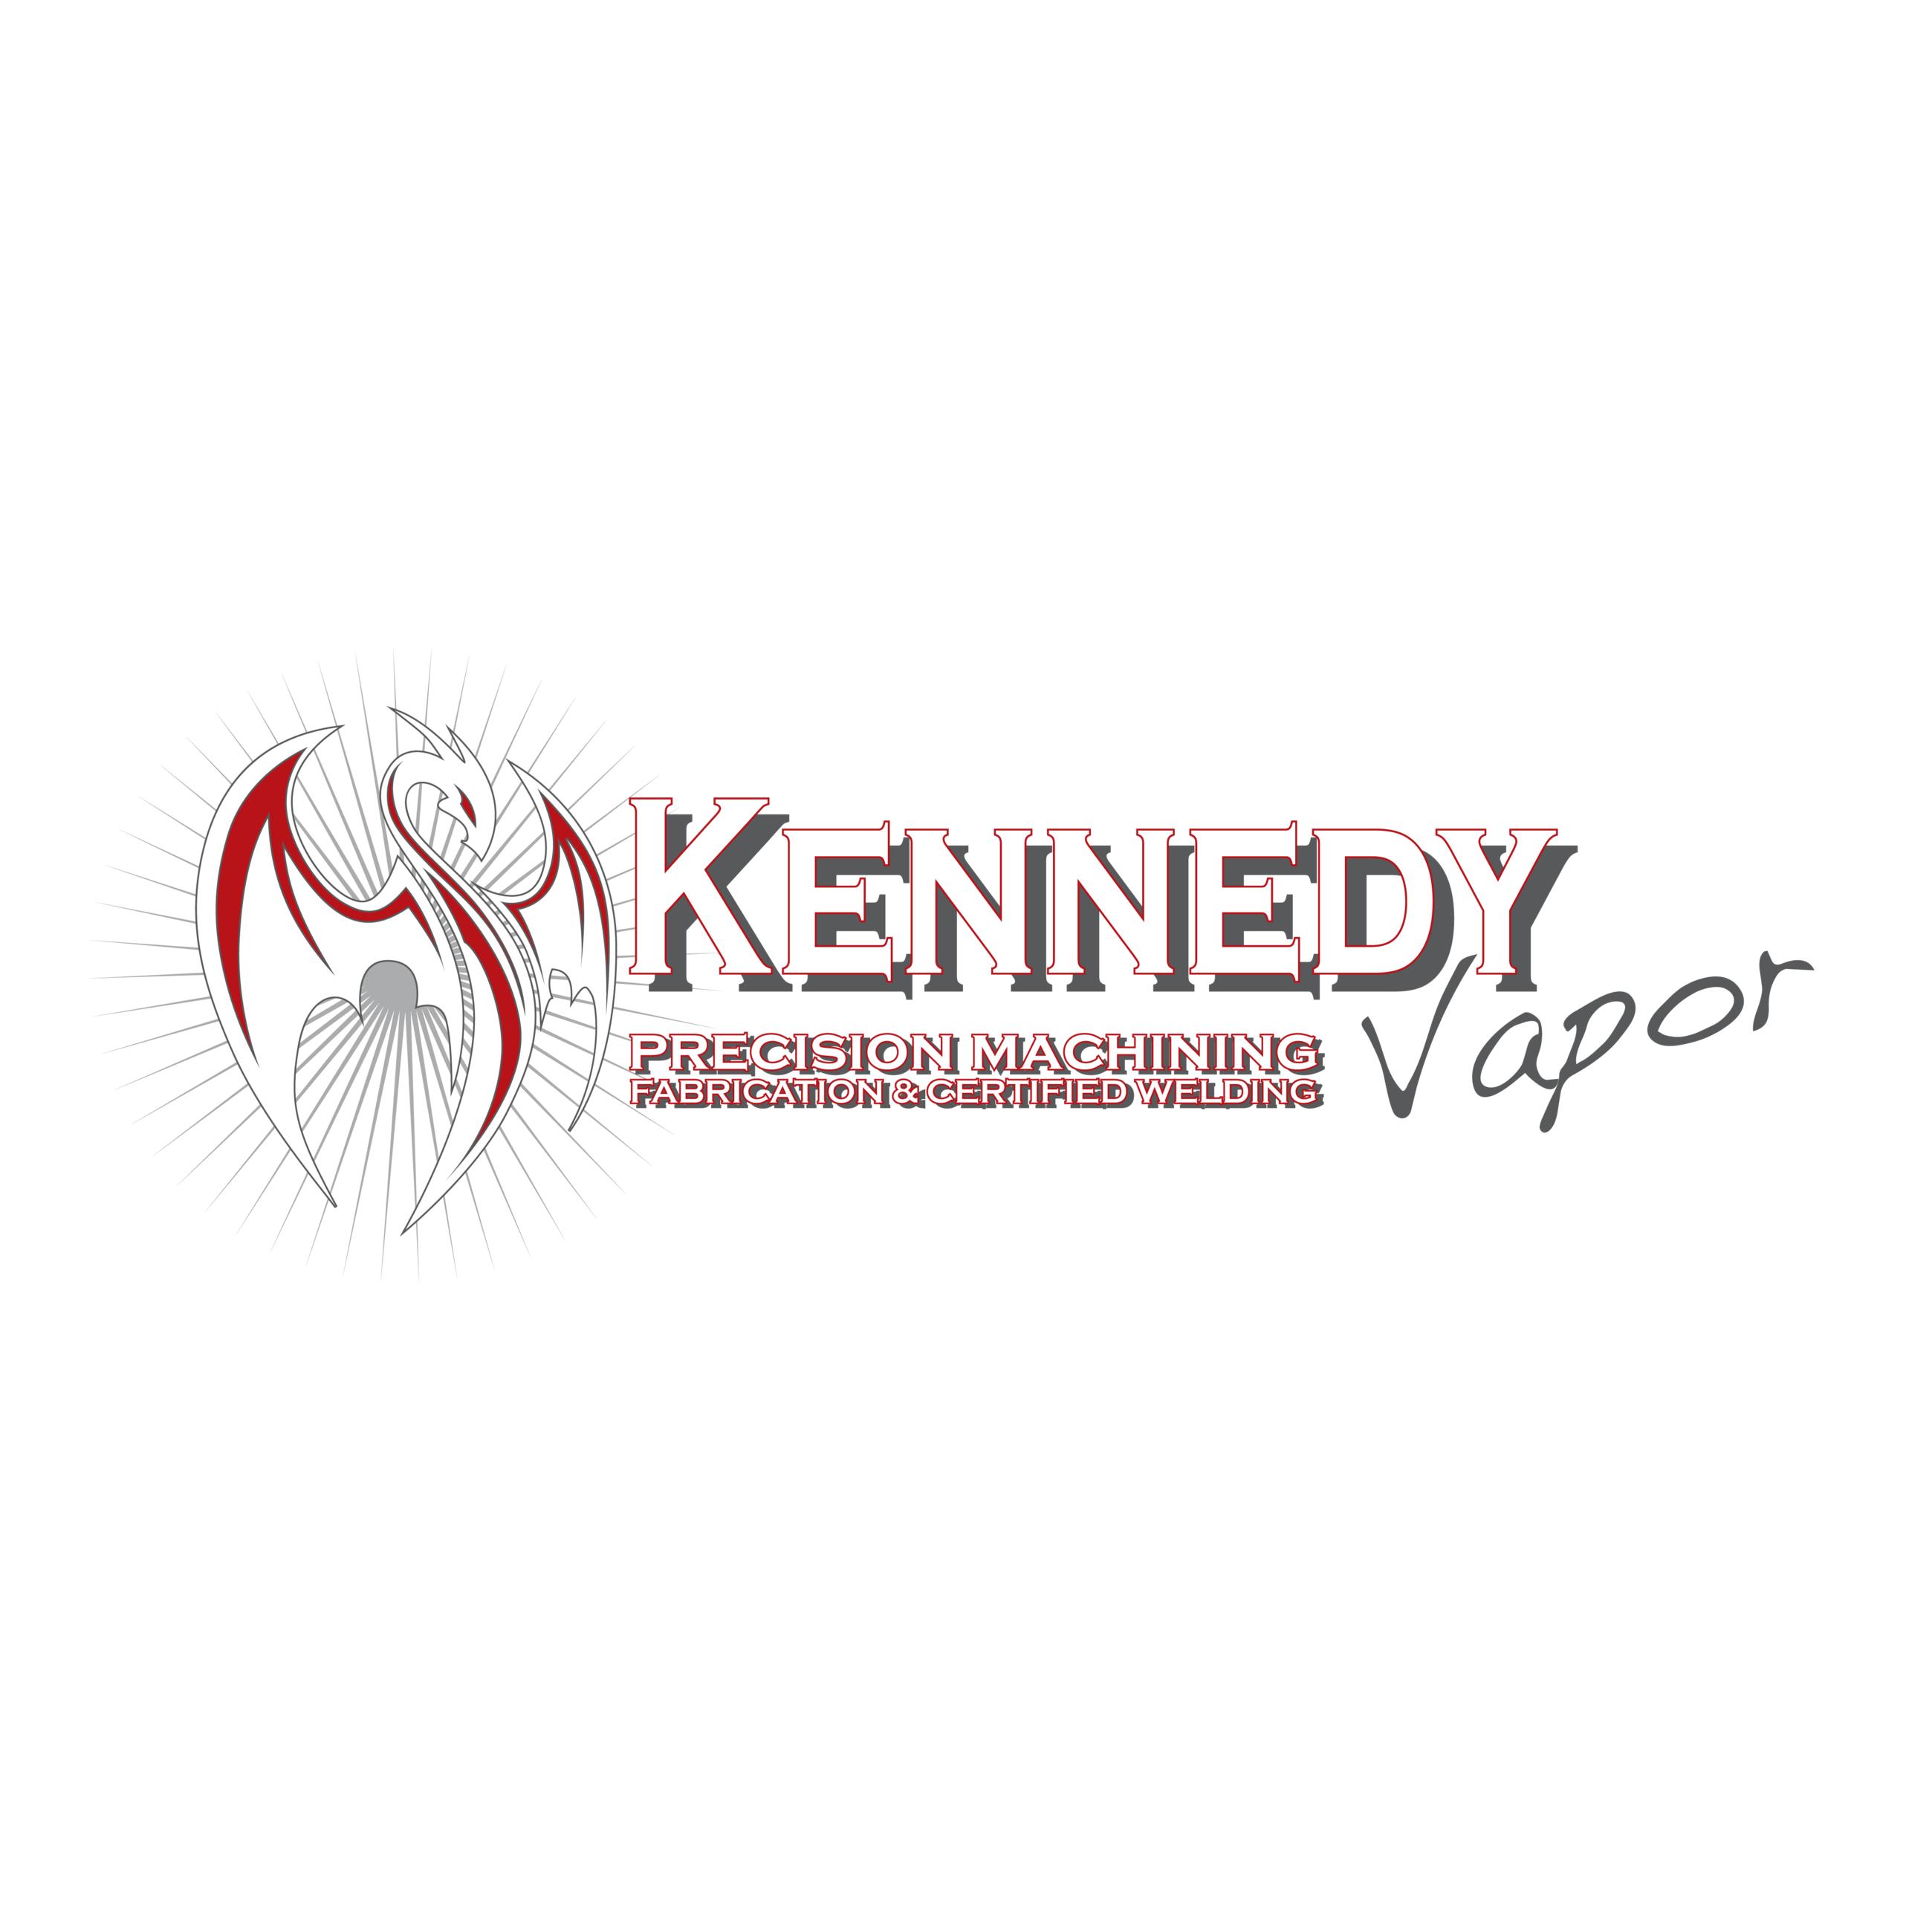 Atom Kennedy Vapor